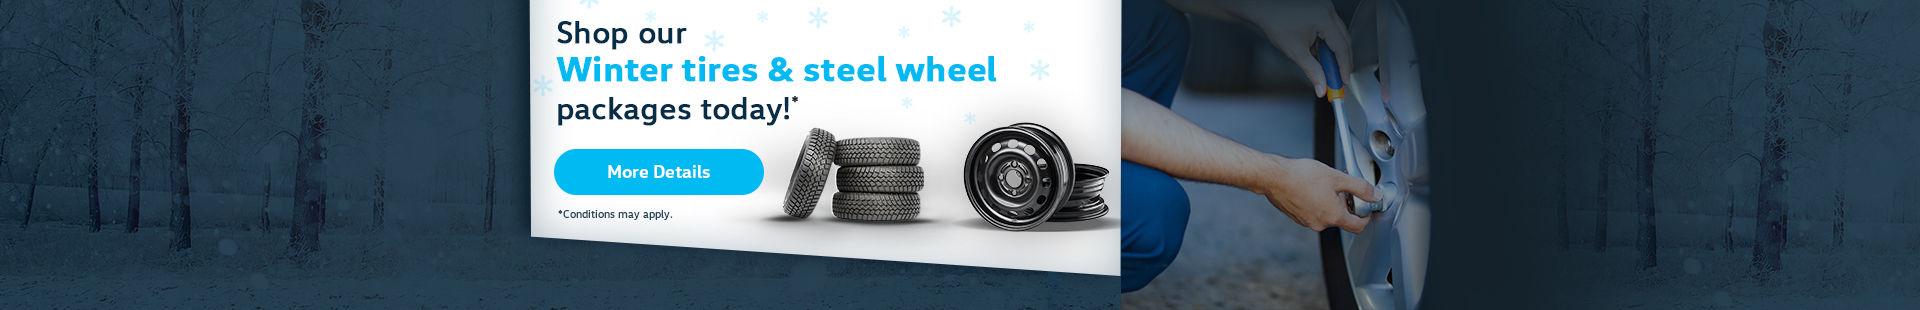 Winter Tires / Wheels promos